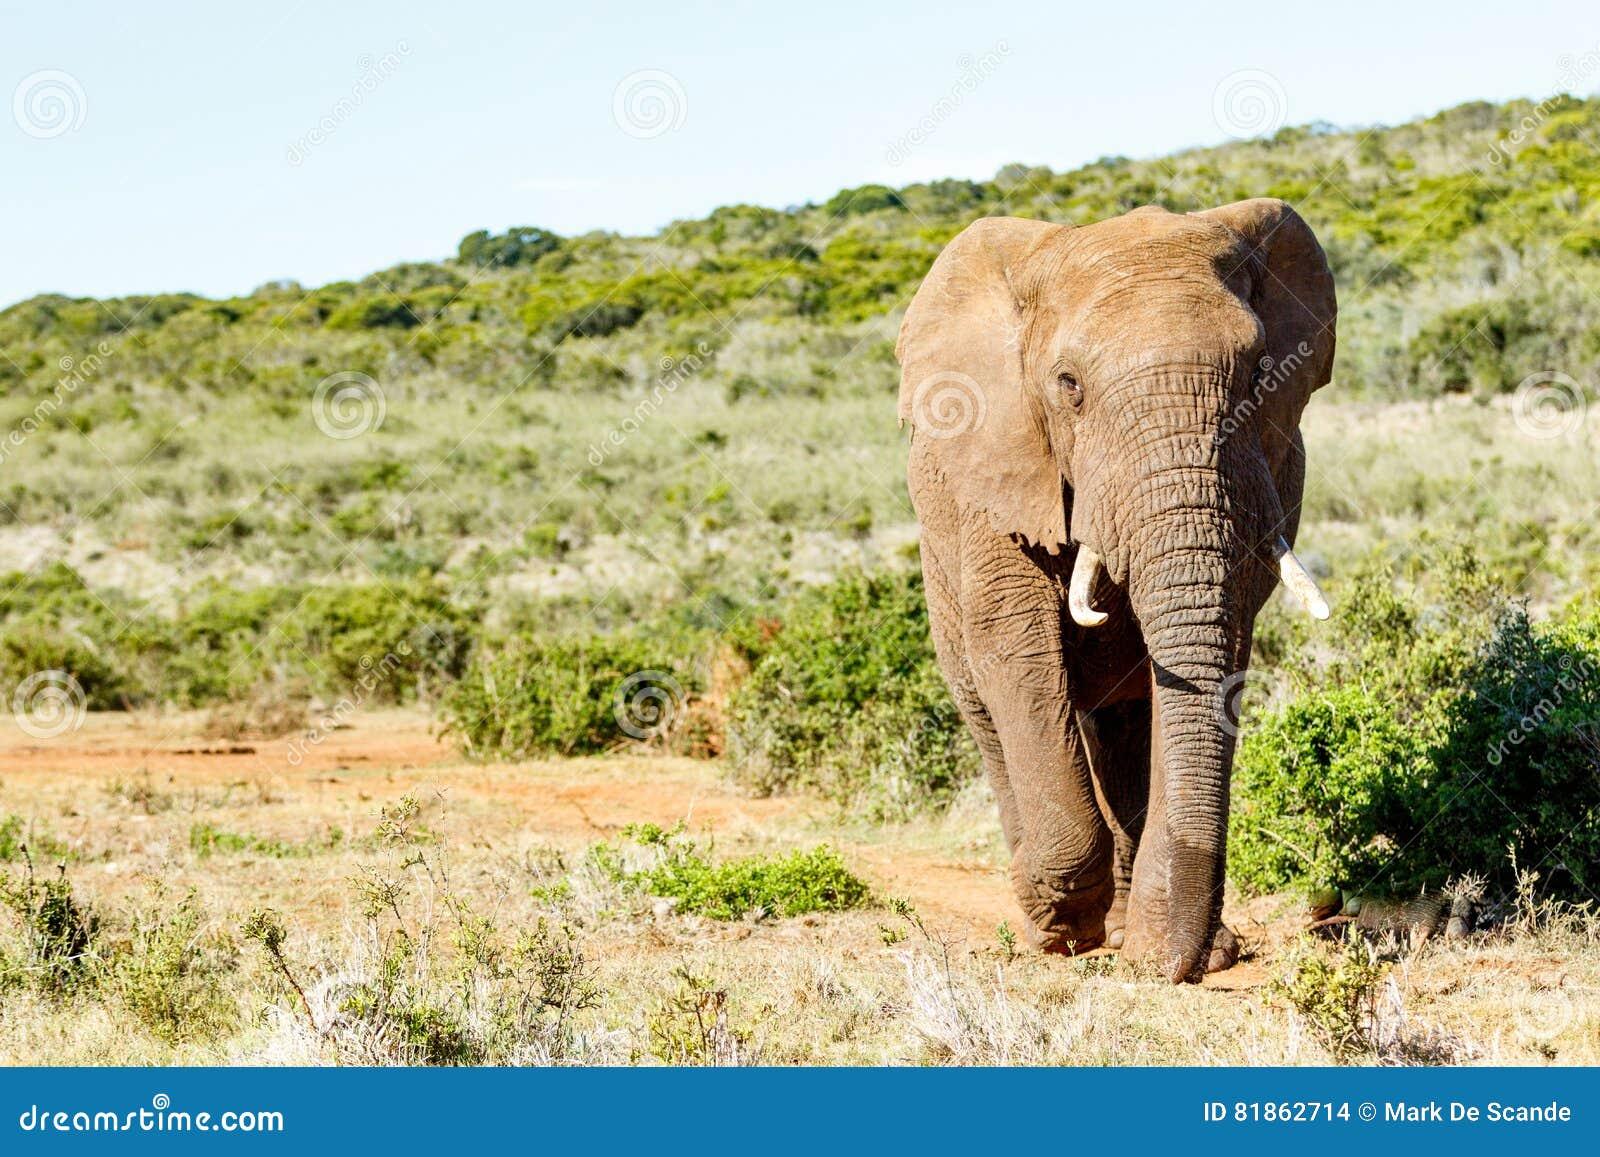 African Bush Elephant walking